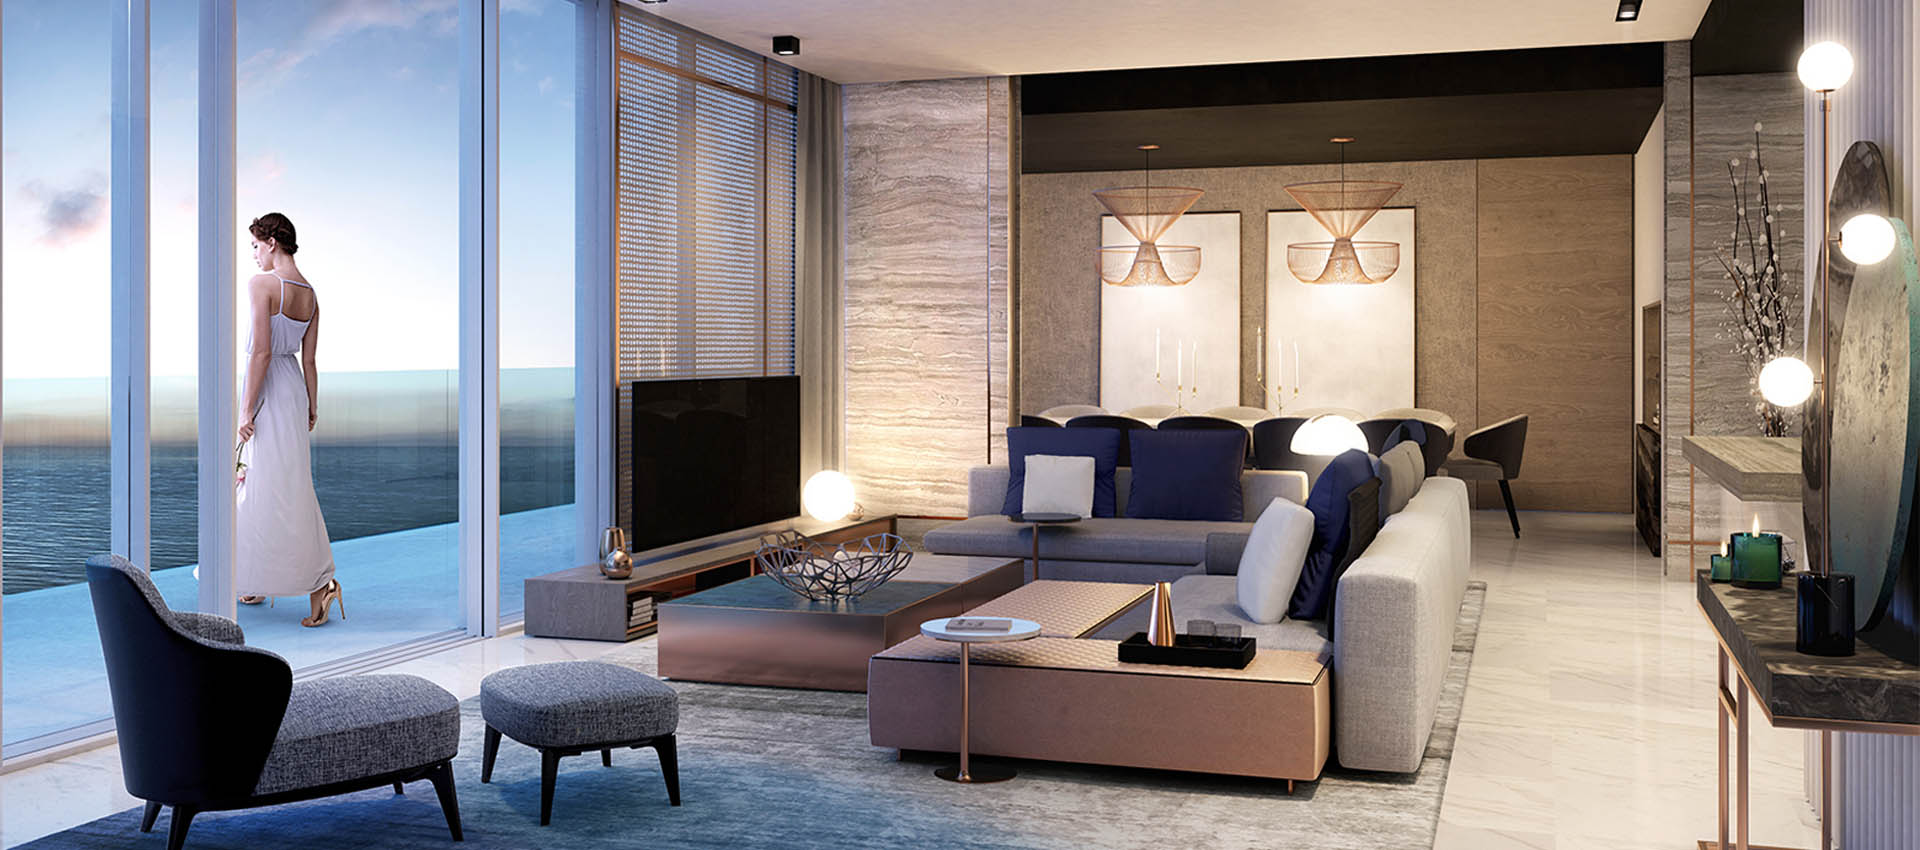 The 8 by IFA Hotel & Resorts at Palm Jumeirah